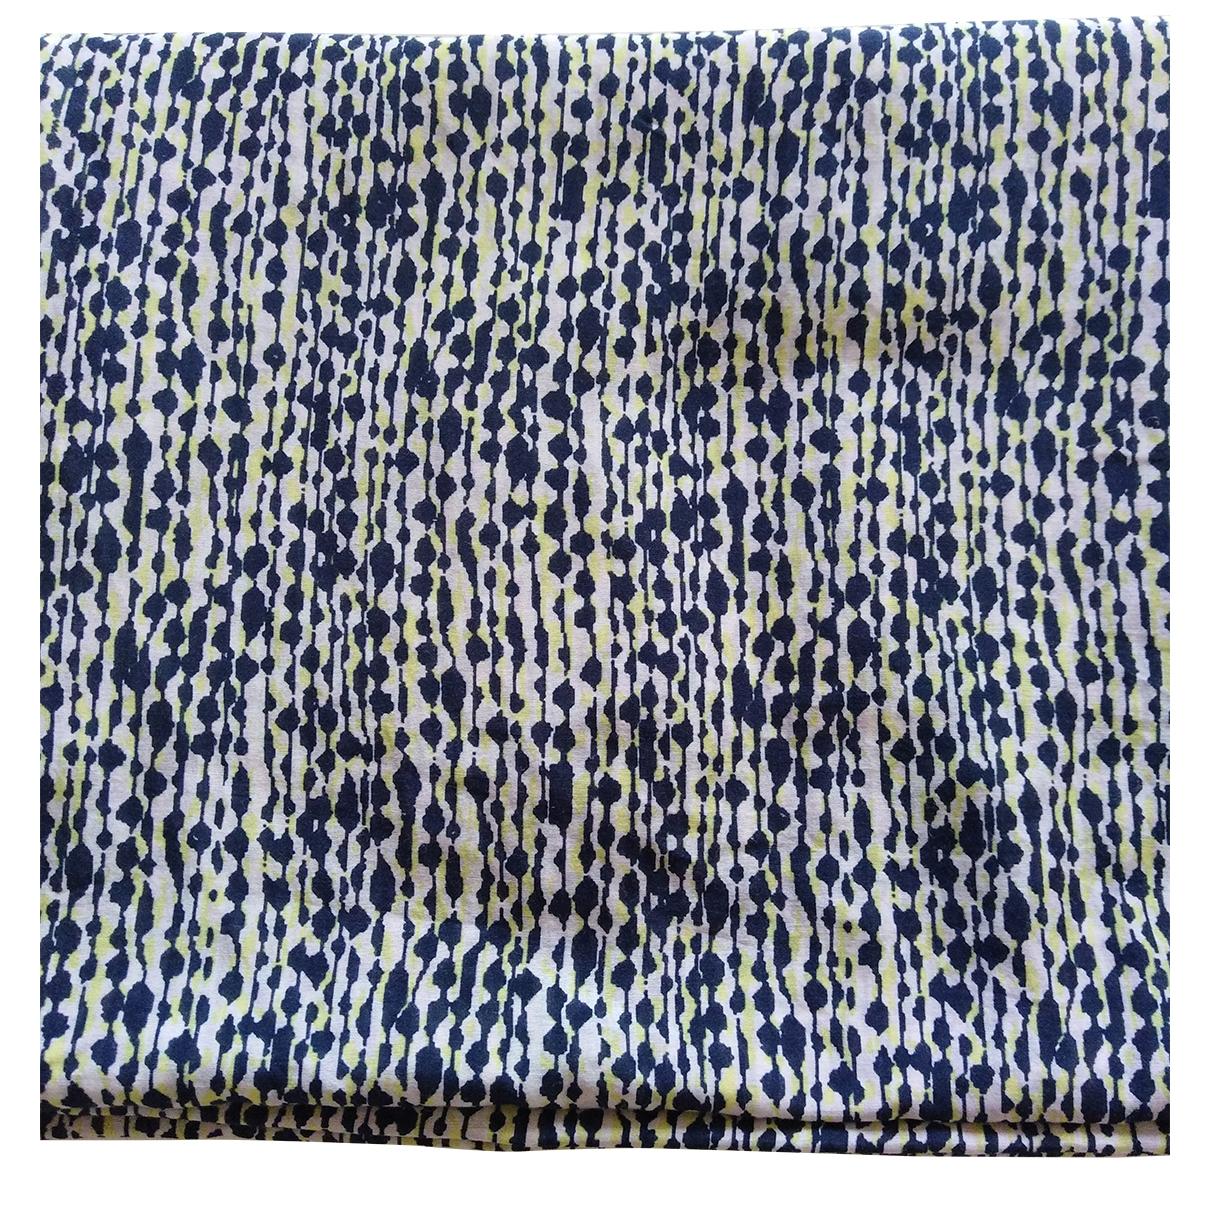 Cos \N Multicolour Cotton scarf for Women \N